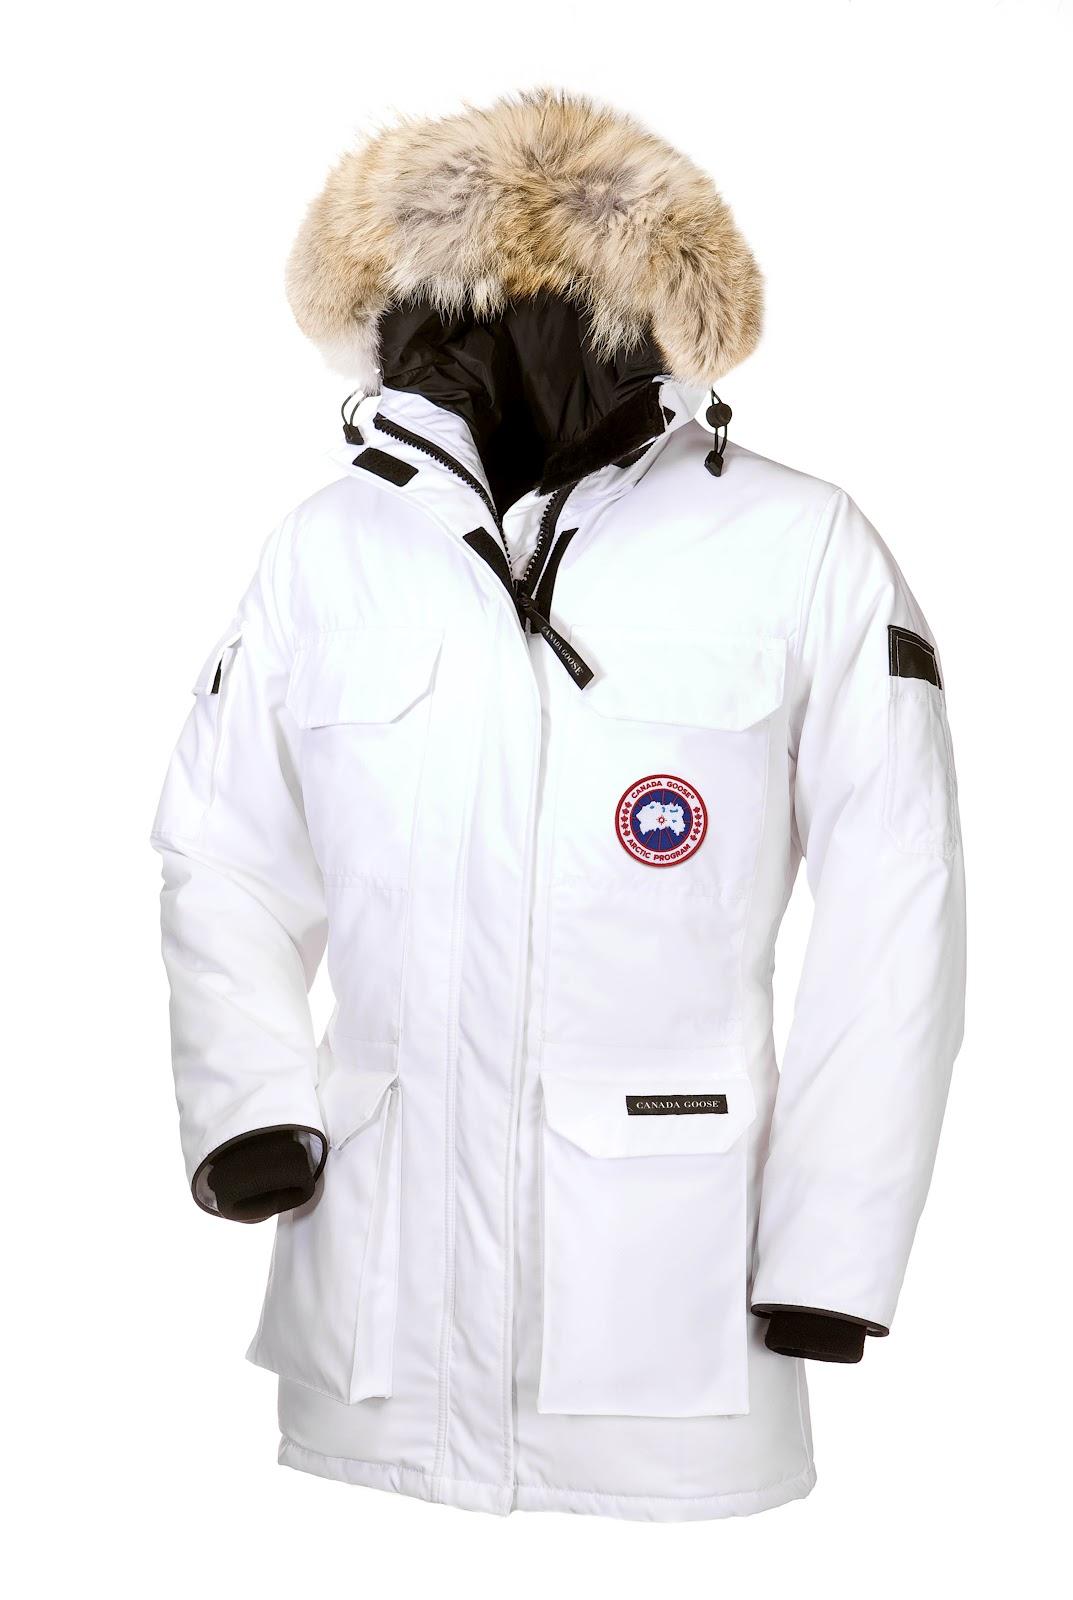 Canada Goose kensington parka online cheap - 14 oz. berlin blog: CANADA GOOSE >>> BRAVE THE ELEMENTS